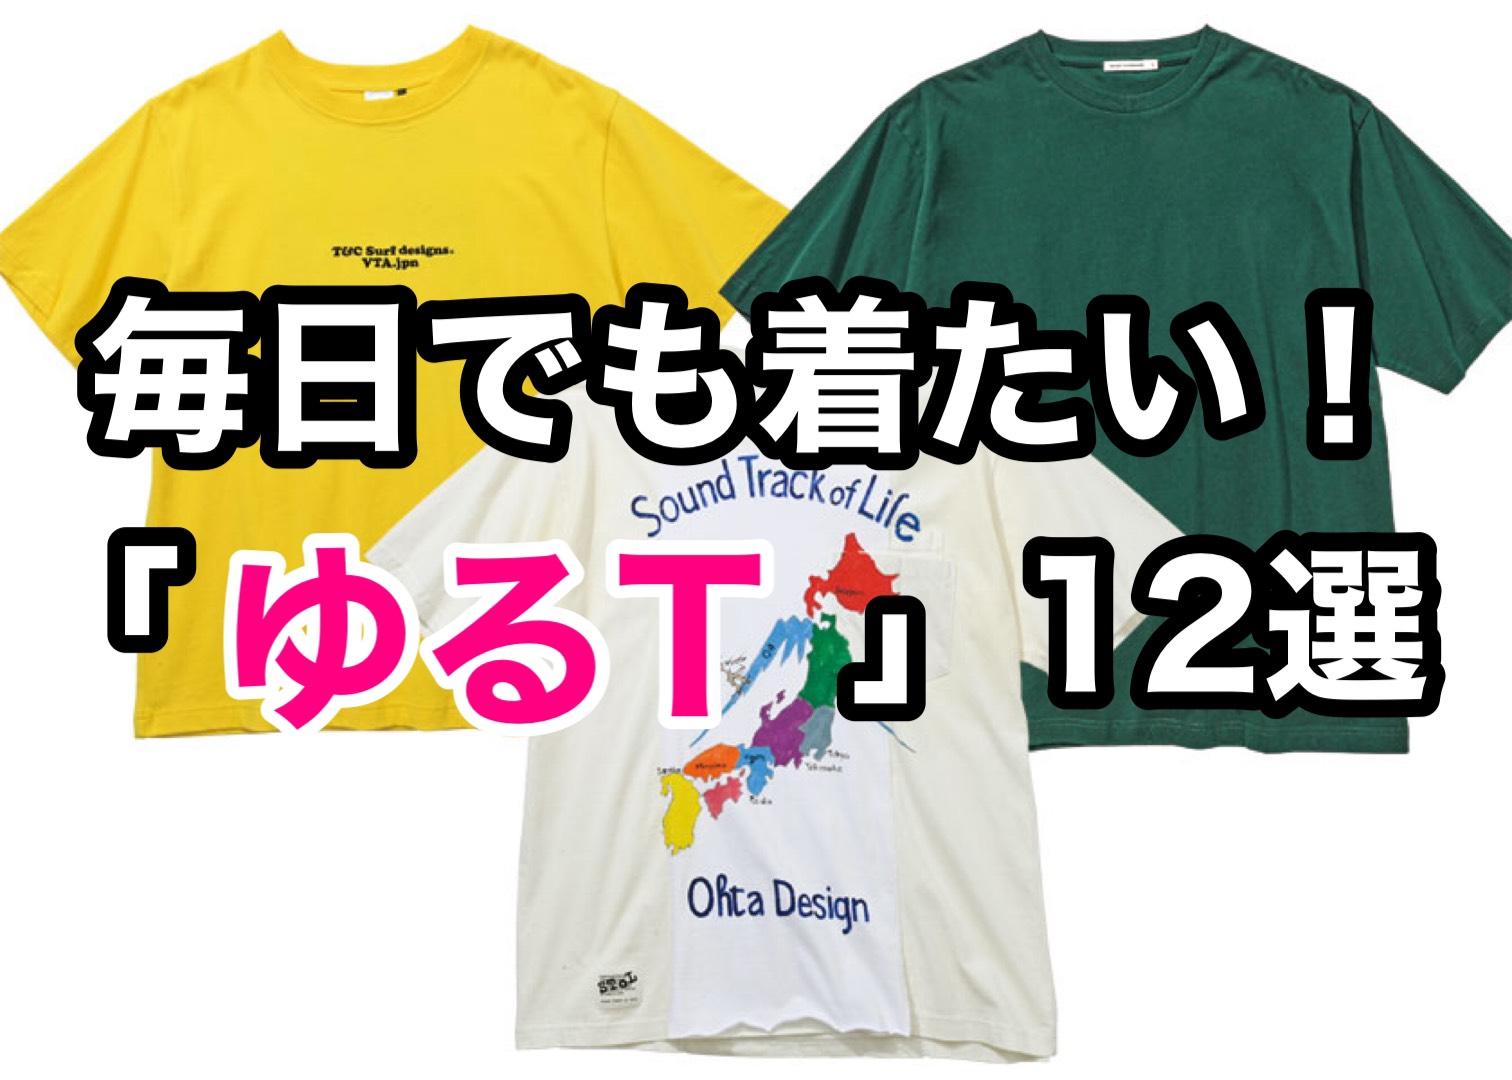 https://cdn.fineboys-online.jp/thegear/content/theme/img/org/article/3459/main.jpg?t=1624764082